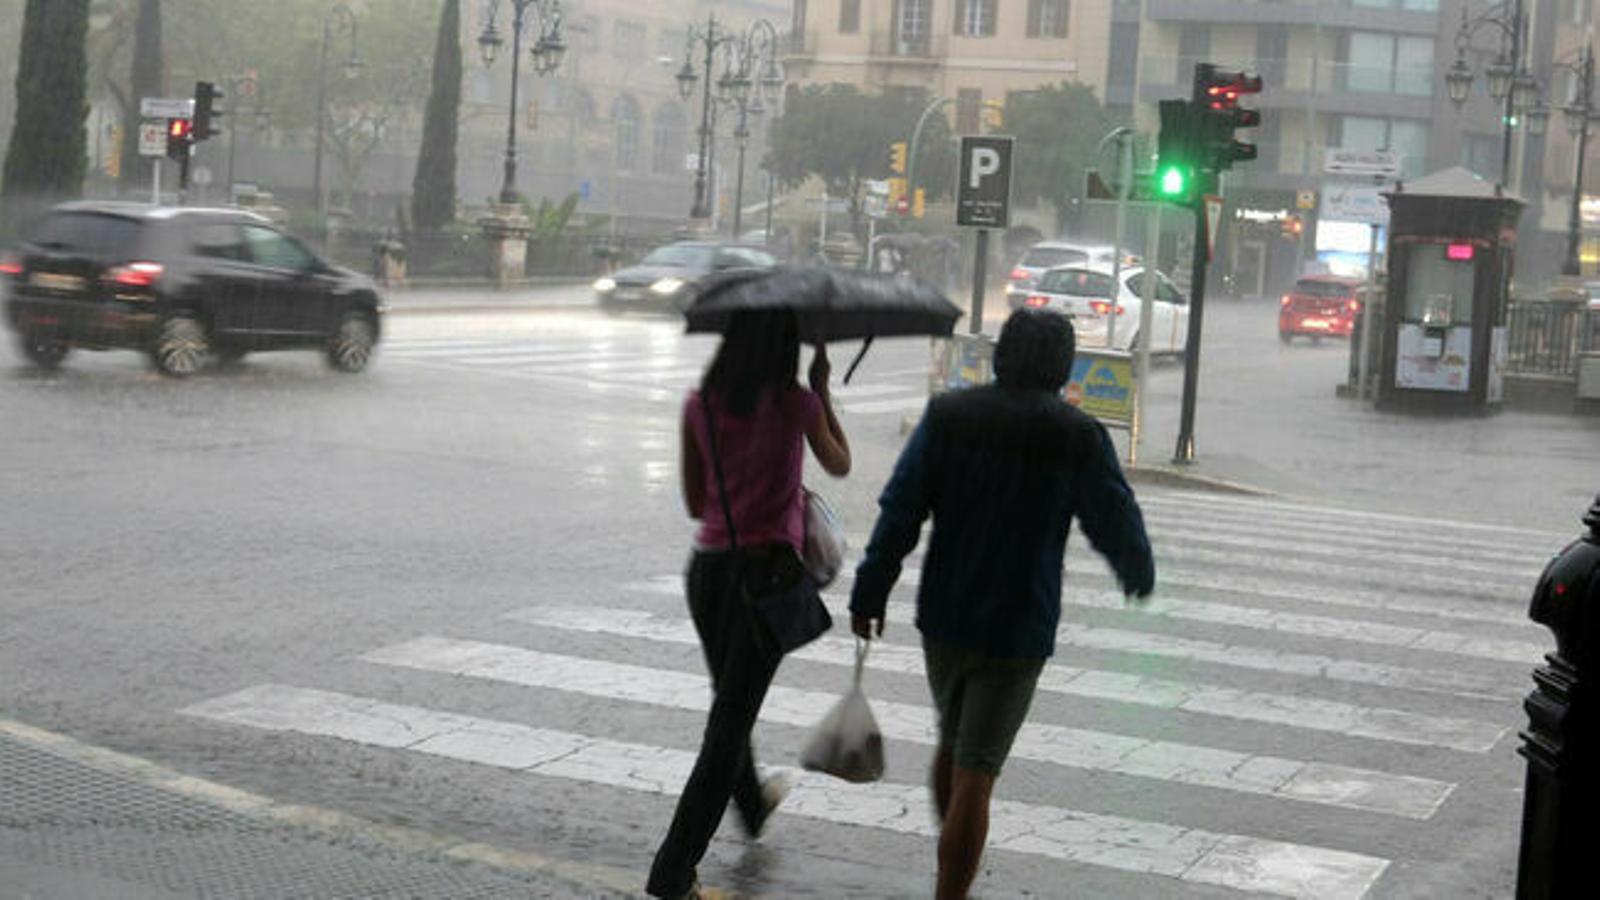 La previsió meteorològica pronostica fortes tempestes. / ENRIQUE CALVO